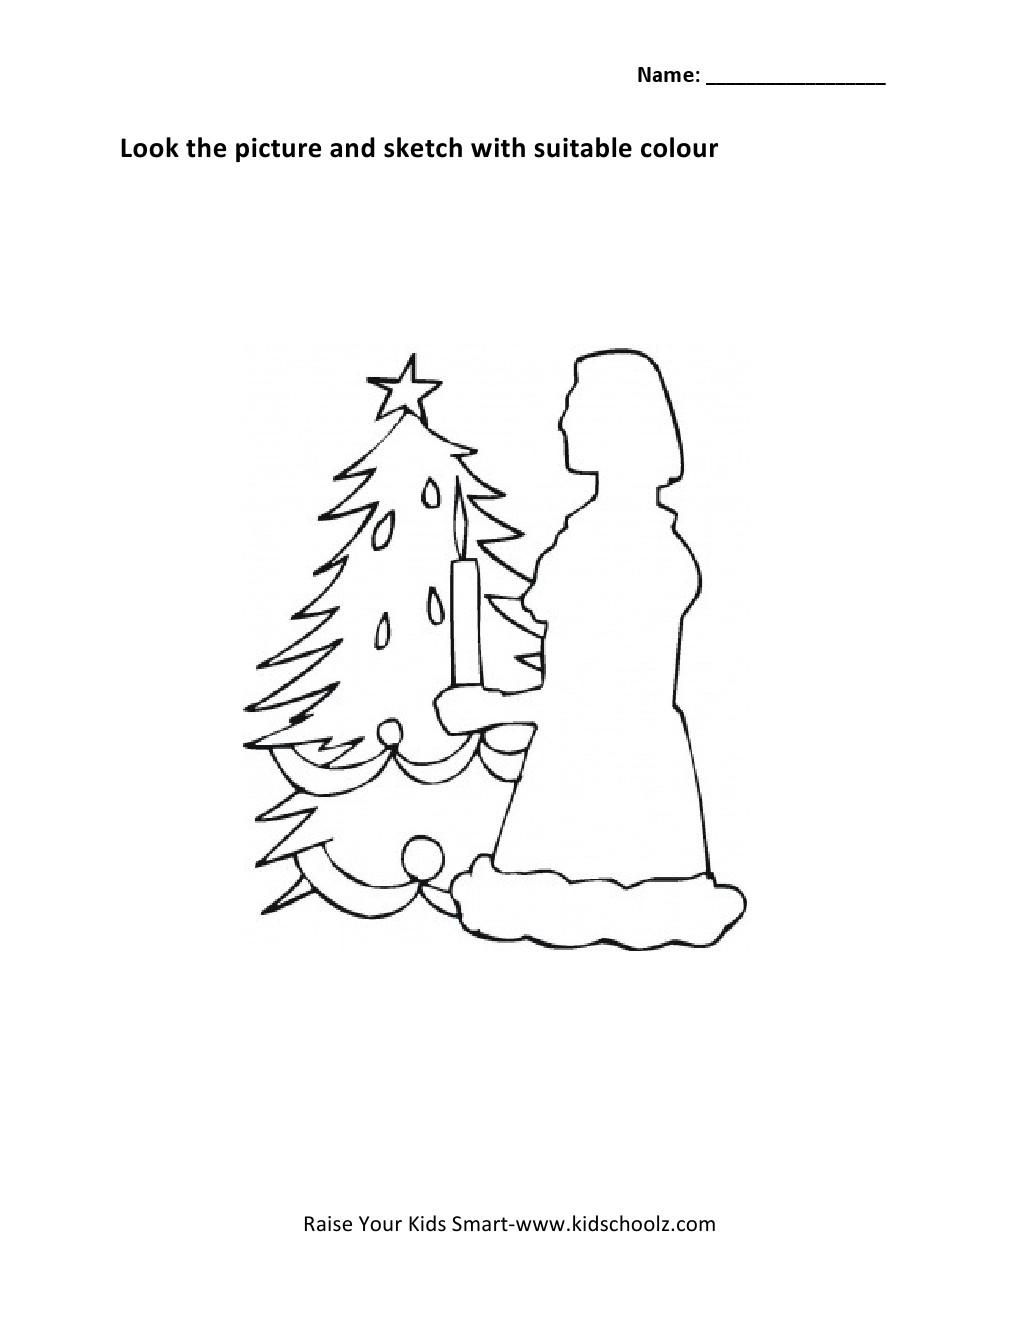 Colouring worksheets for lkg - Z Colouring Worksheets Christmas Colouring Worksheet Kidschoolzkidschoolz